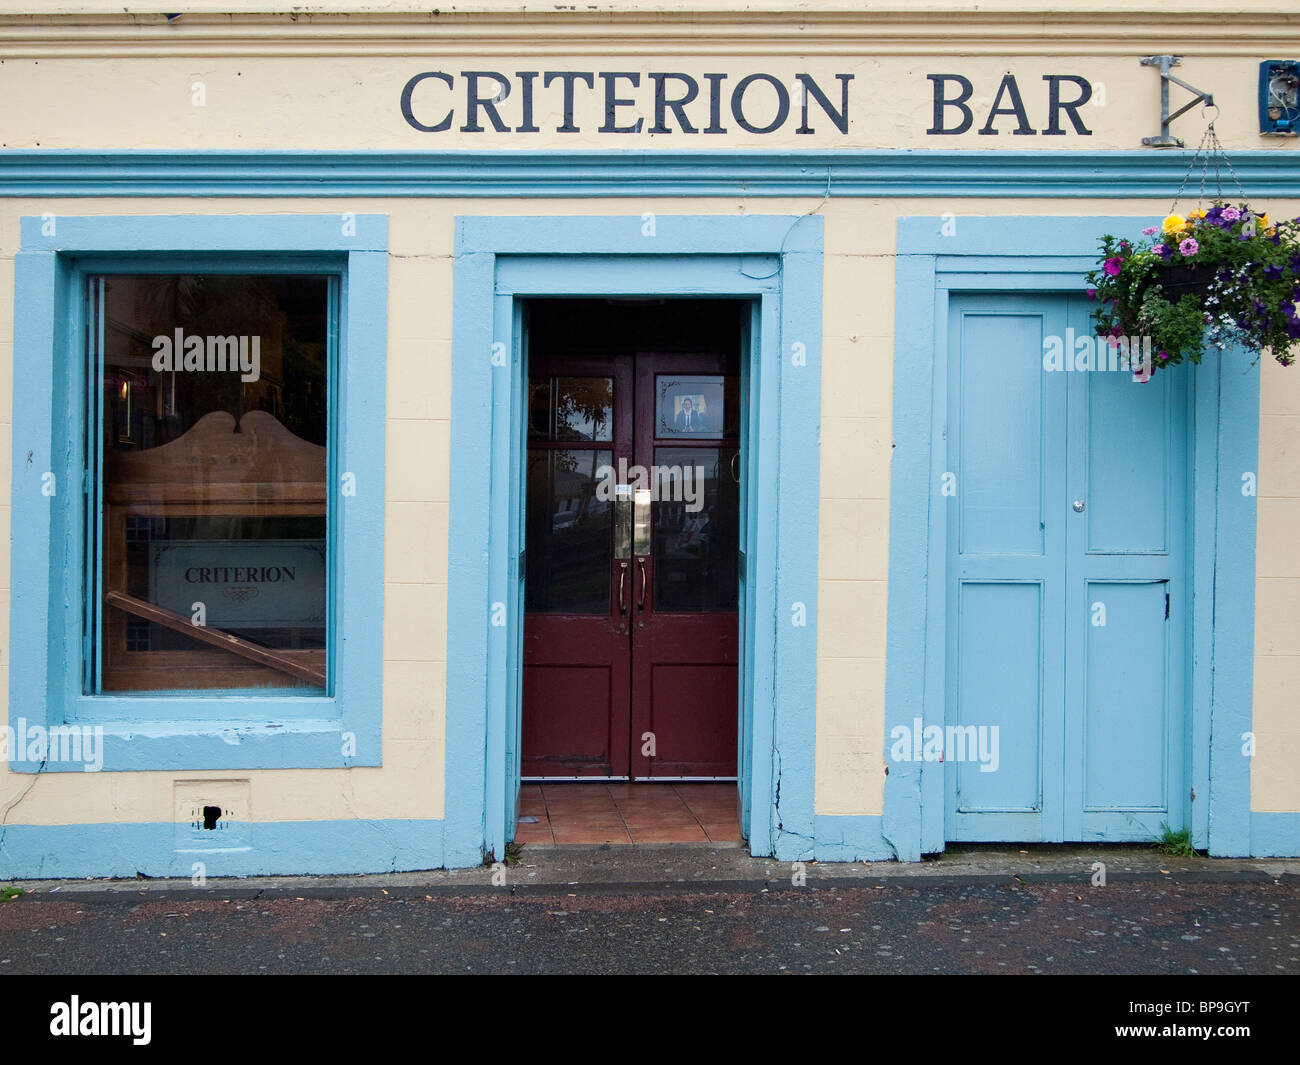 Criterion Bar, Stornoway, Isle of Lewis - Stock Image